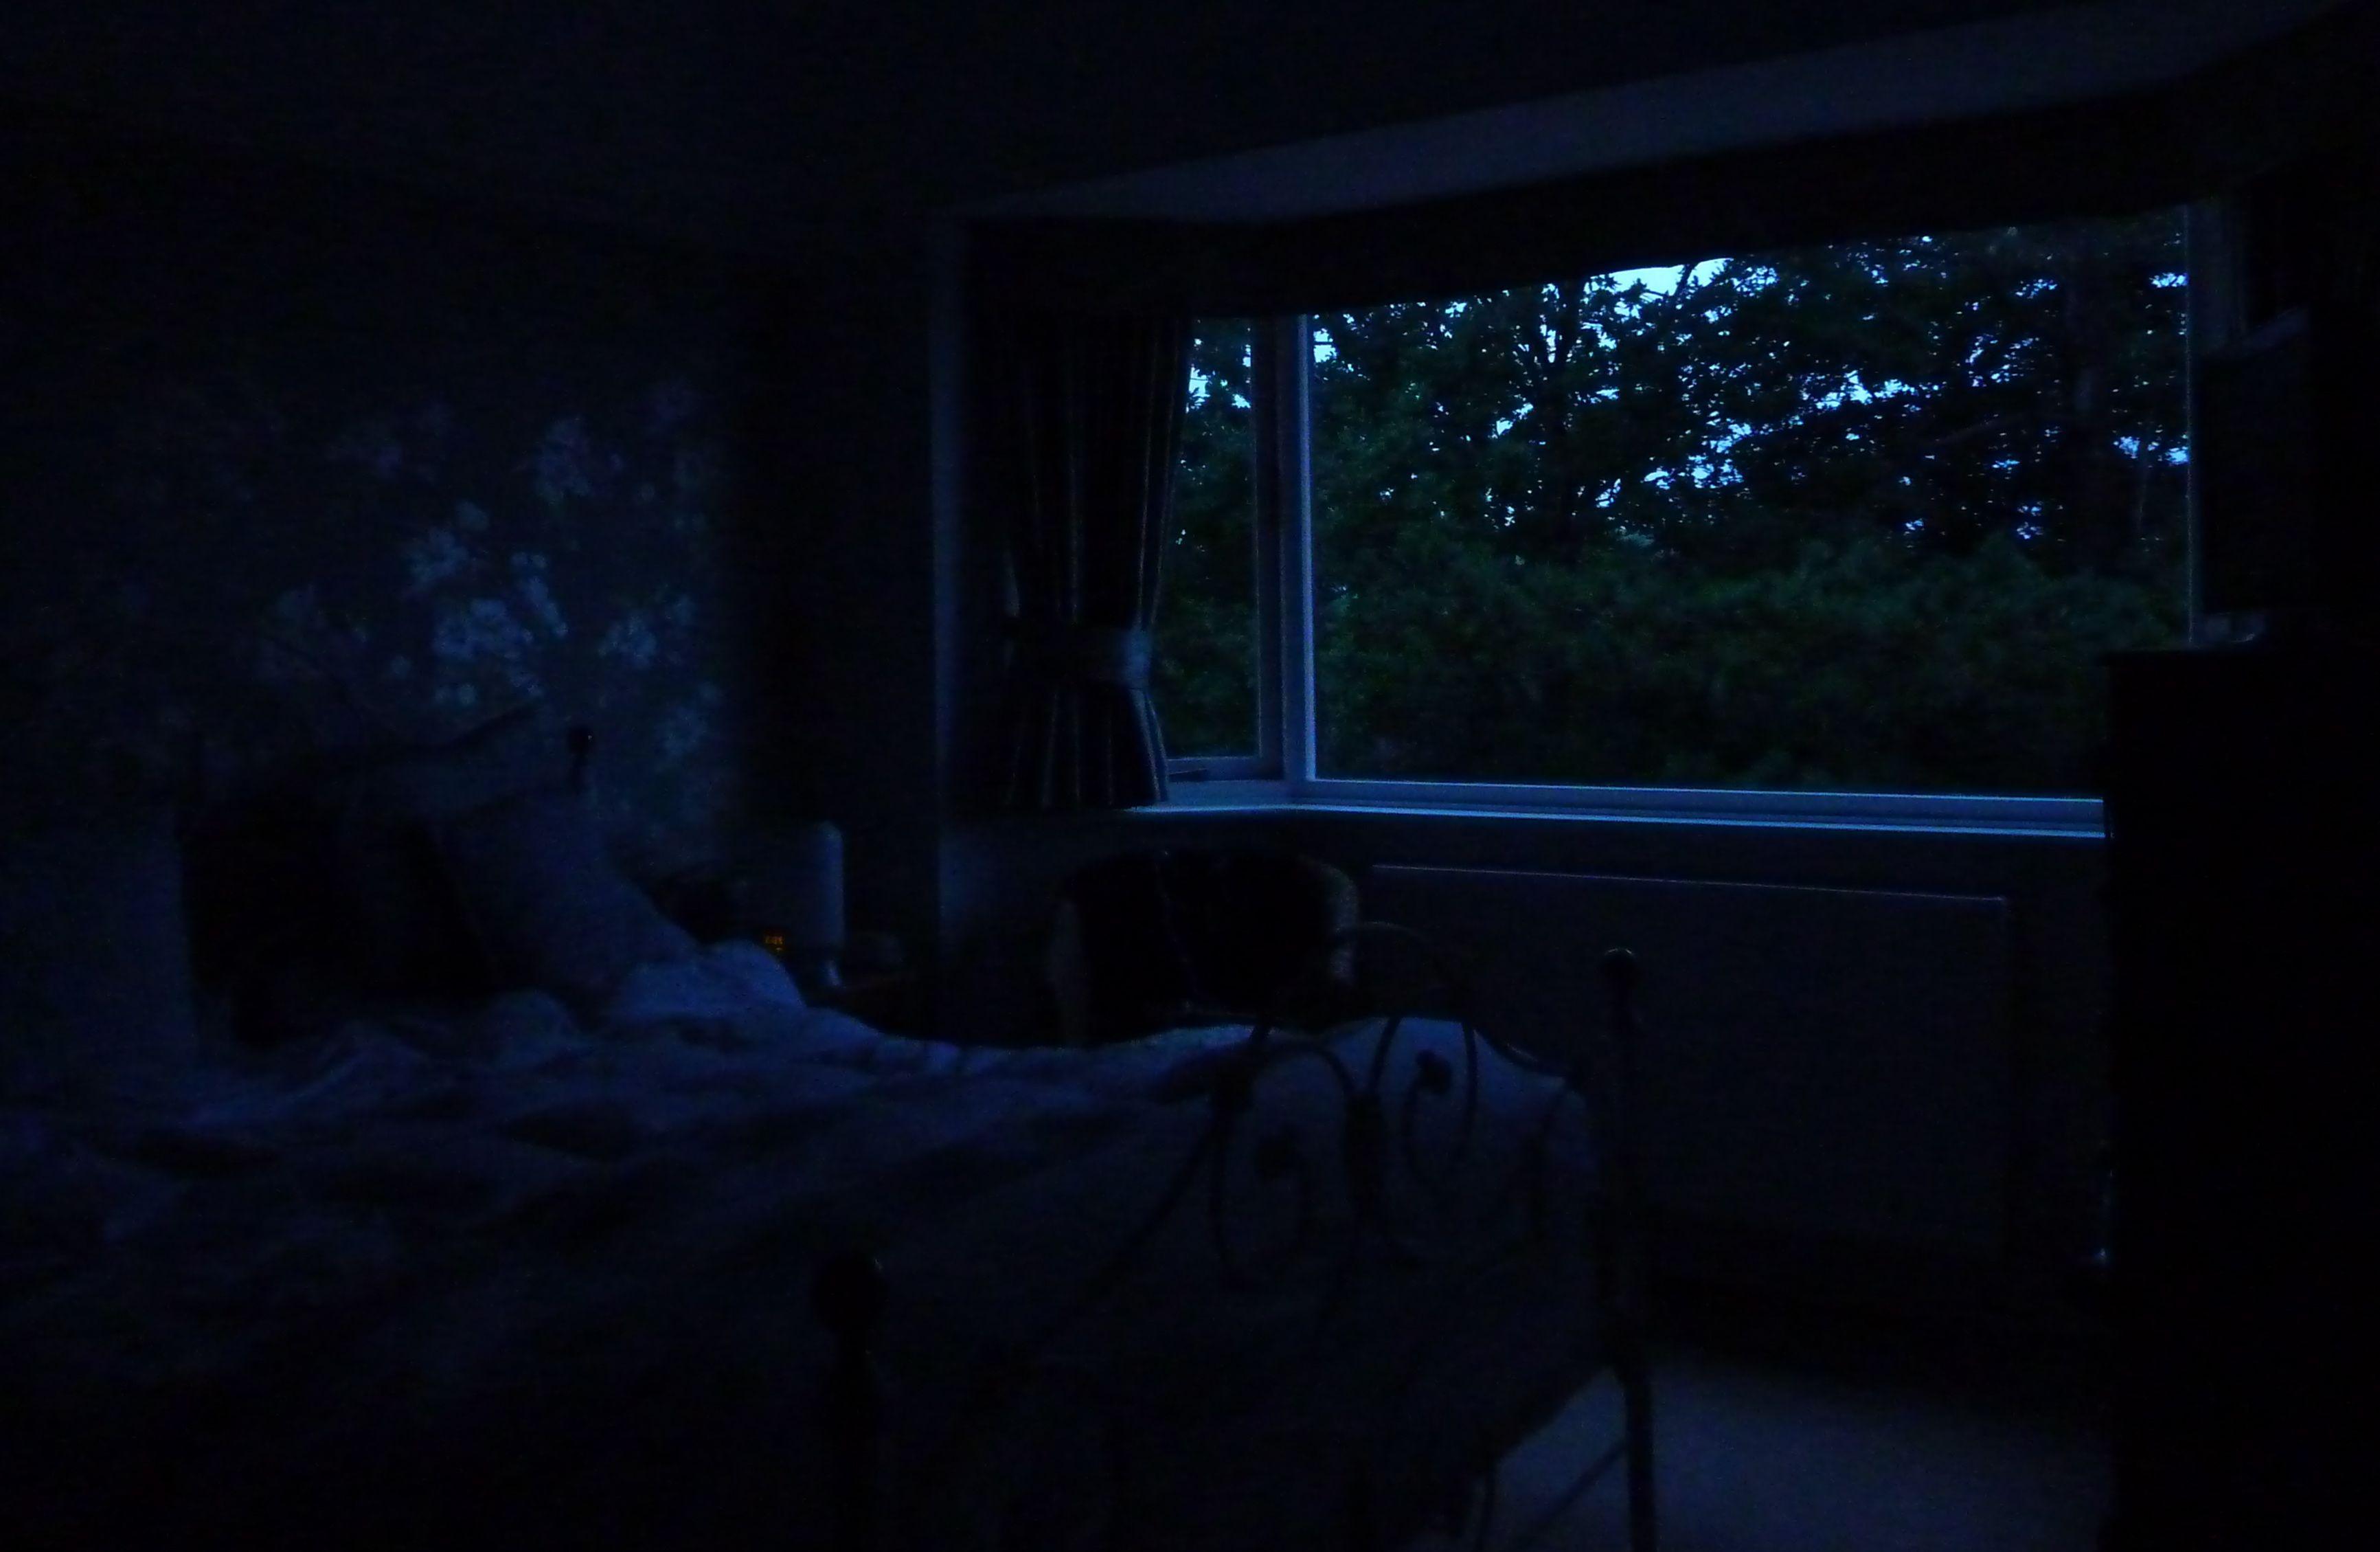 Dark 3465 2259 lighting research pinterest for The family room nightclub